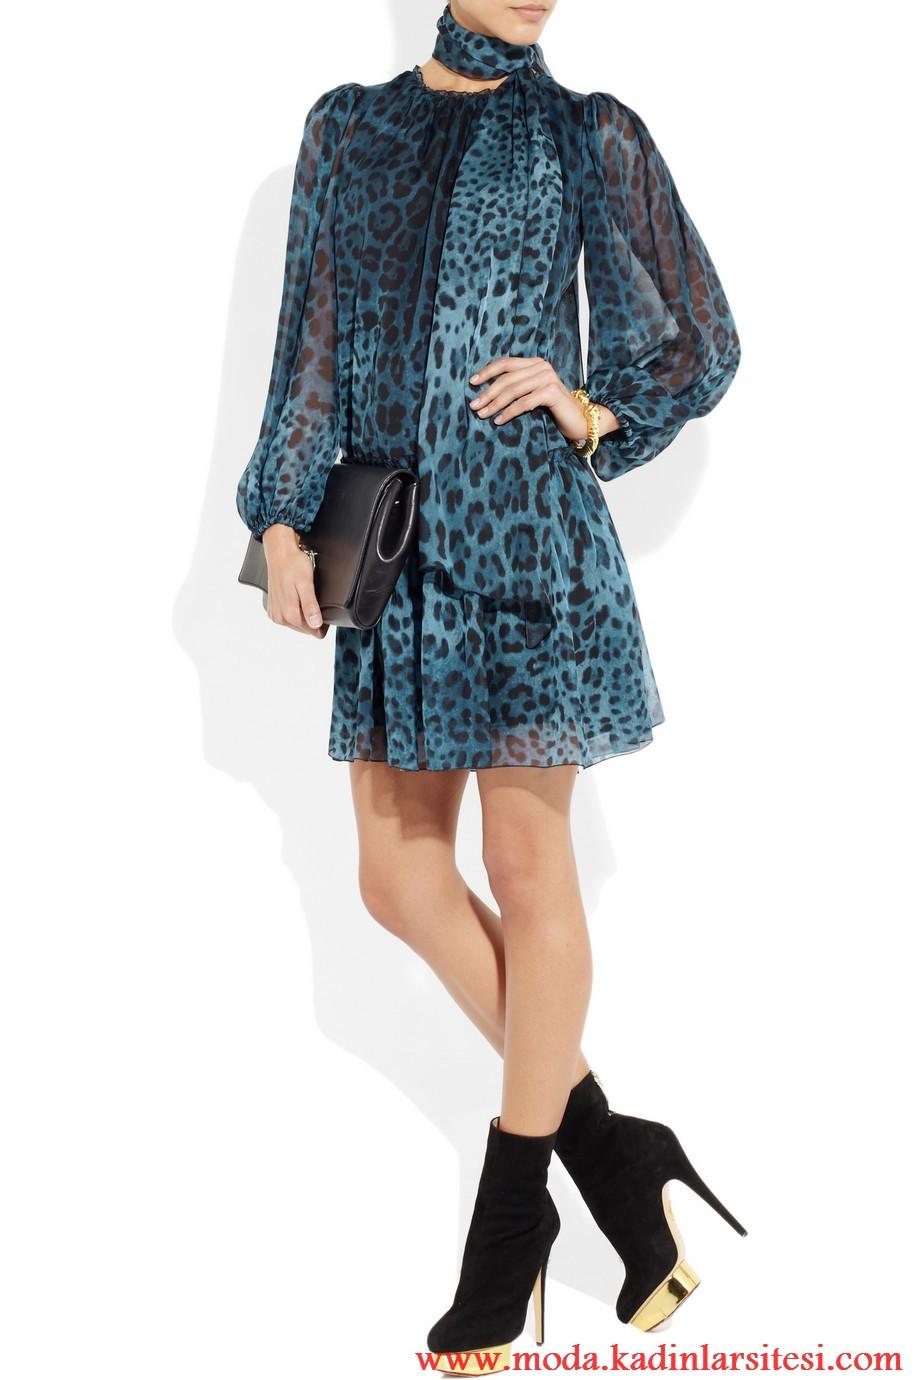 dolce & gabbana mavi leopar desenli elbise modeli